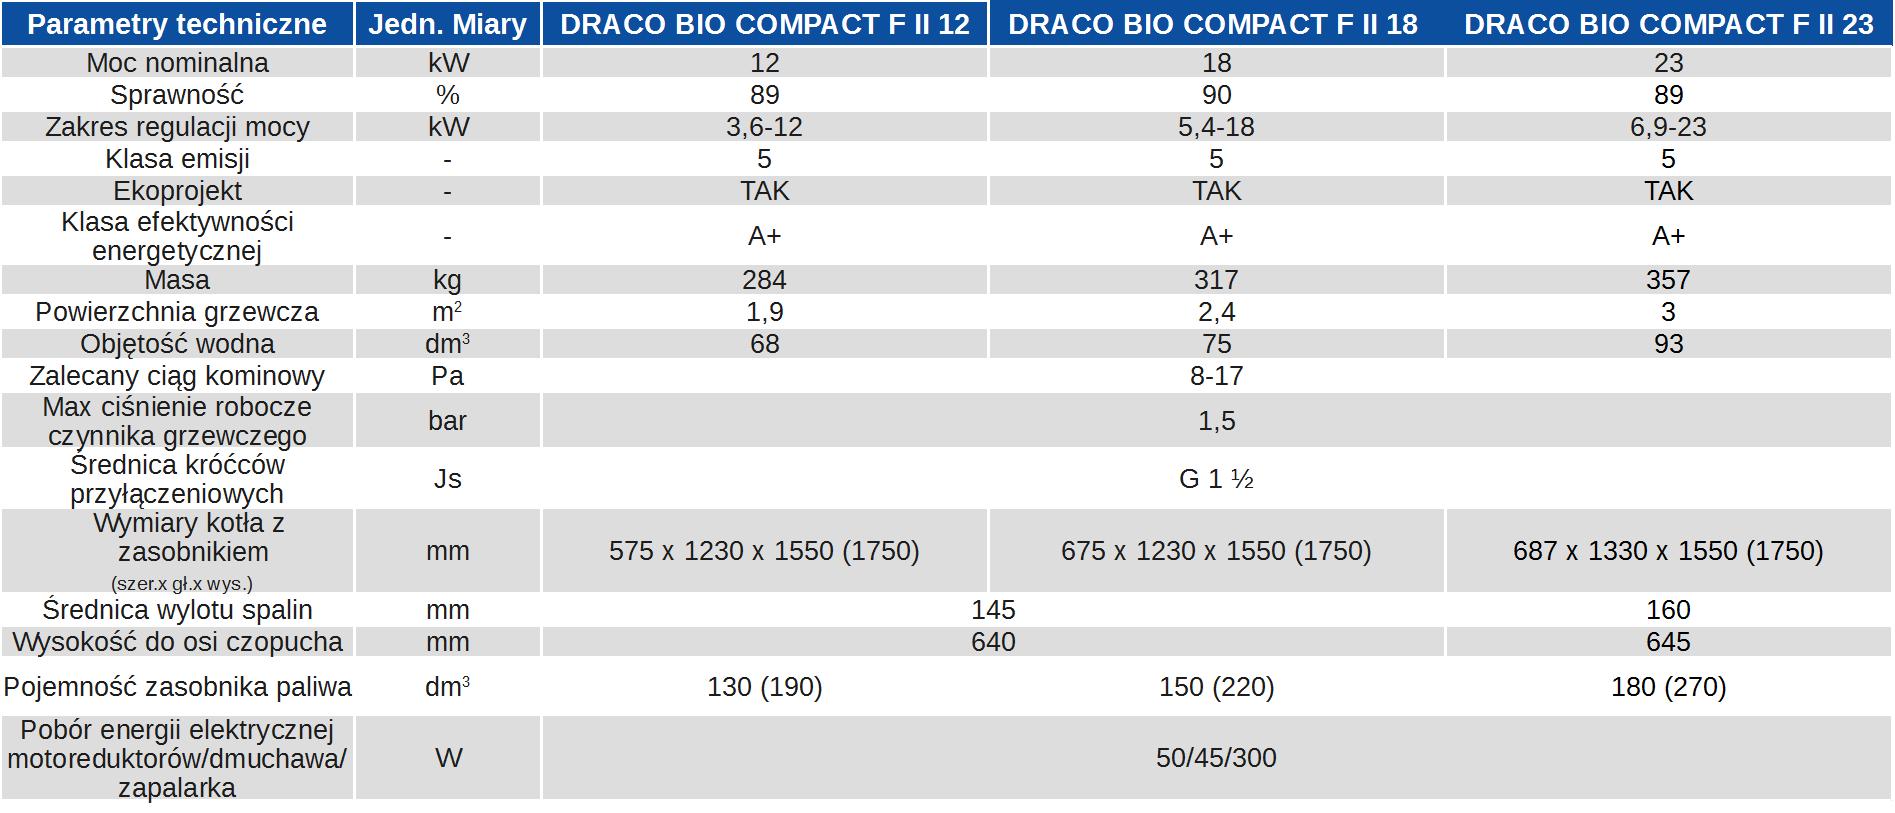 Dane techniczne kotła DRACO BIO COMPACT F II